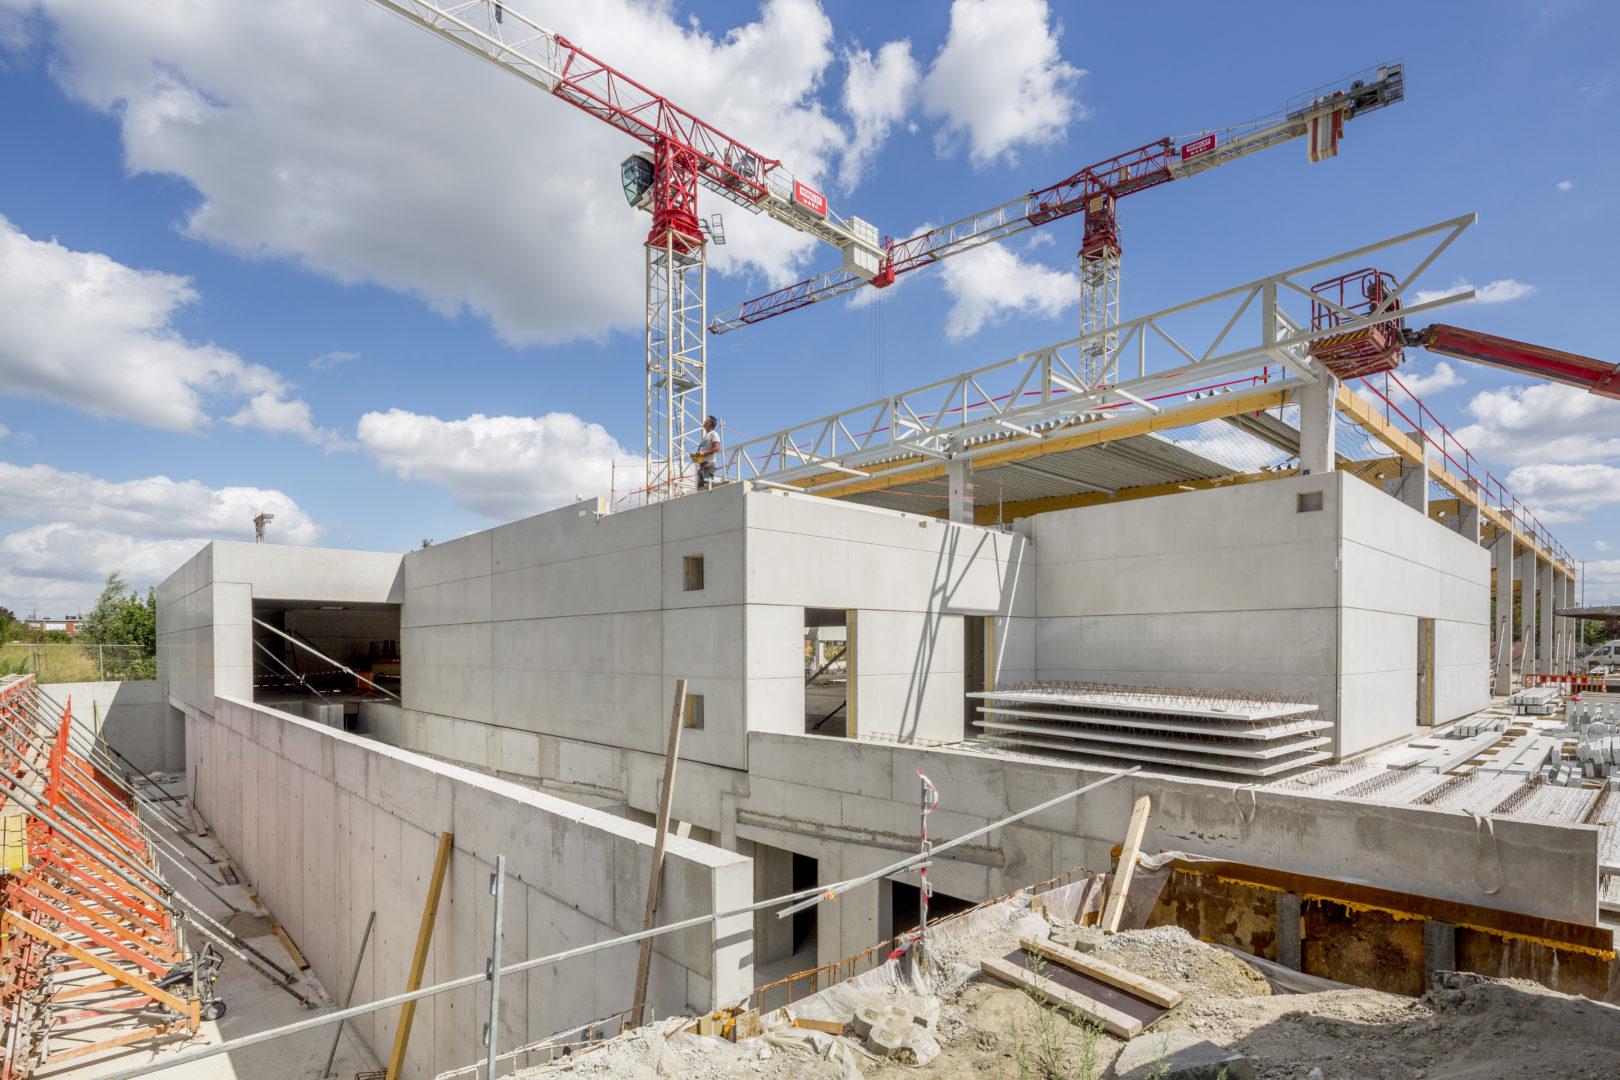 construsoftbimawards - Delhaize Reet